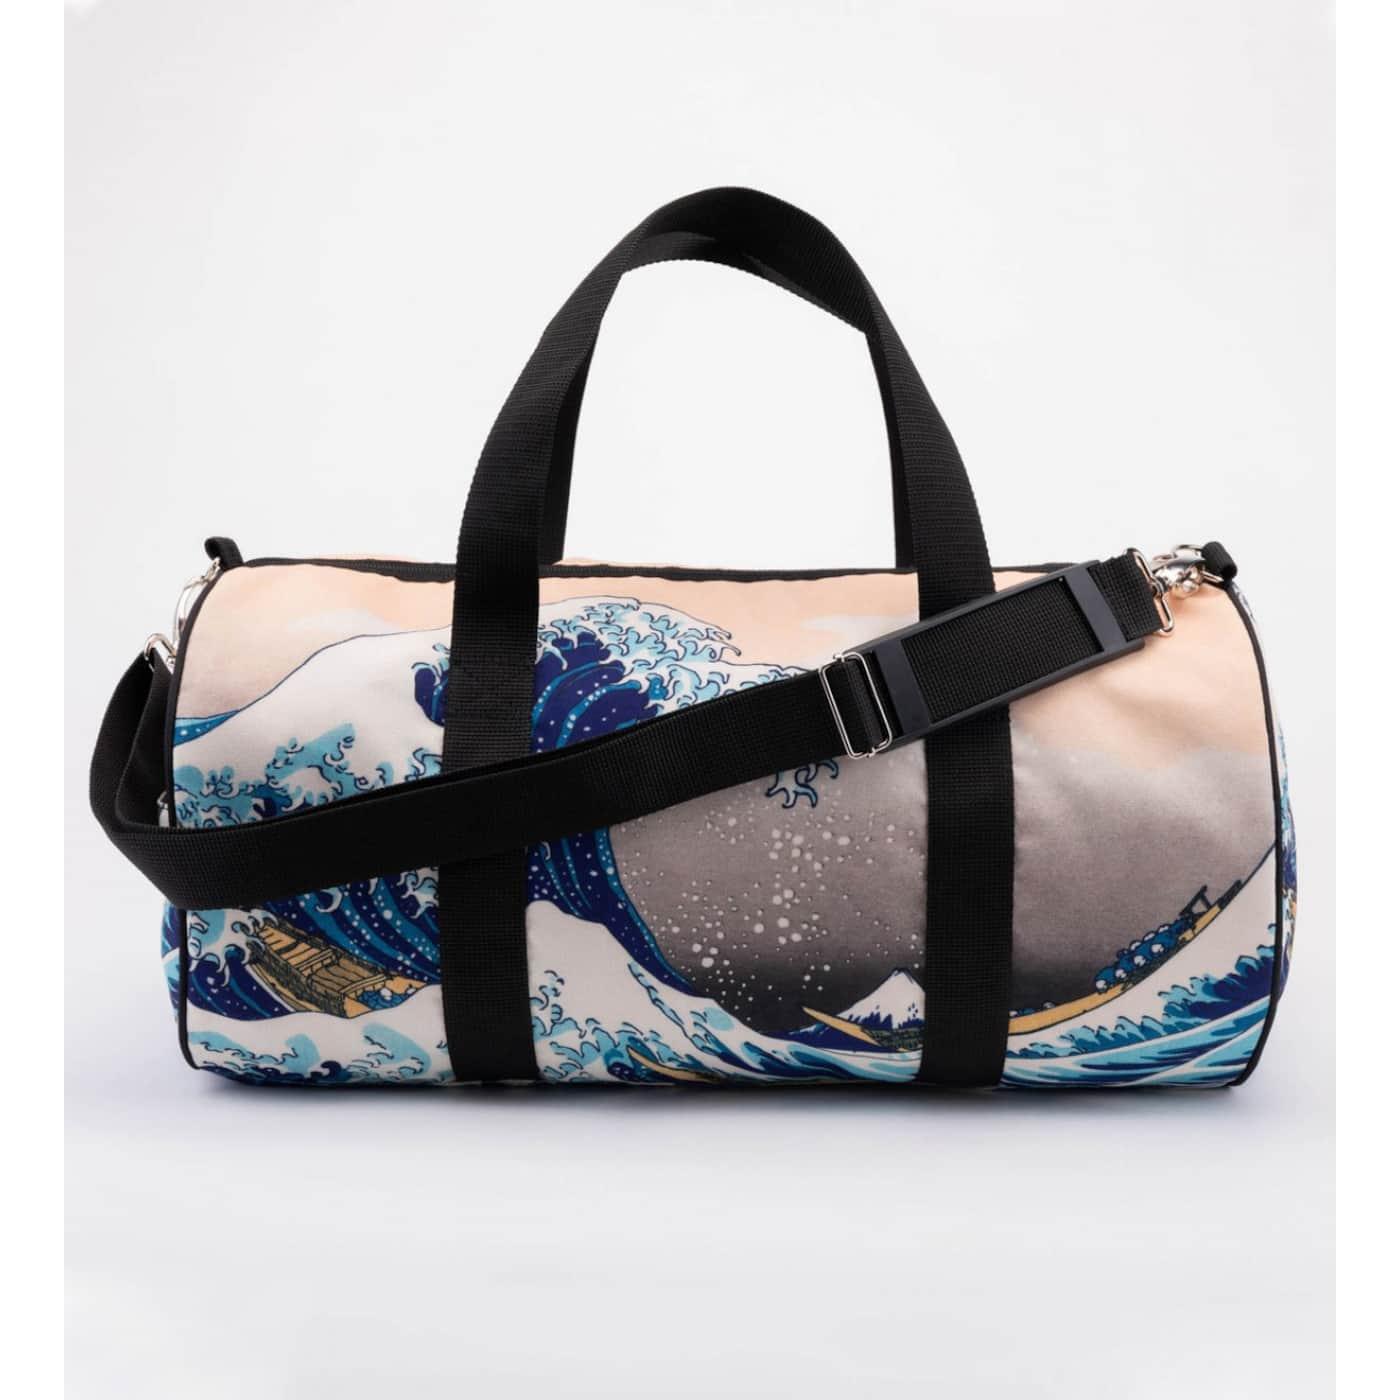 Mr. GUGU & Miss GO Unisex's Bag DUFB1108